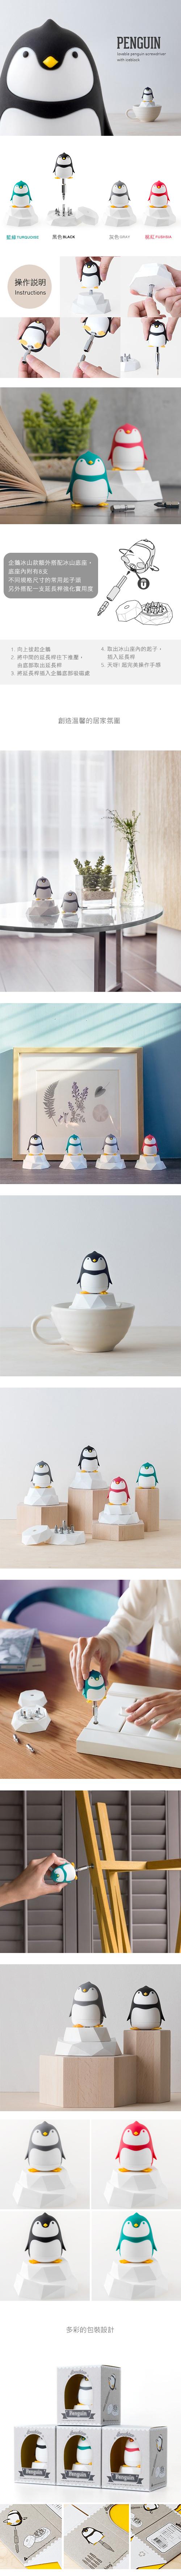 iThinking 企鵝螺絲起子組 冰山款 (8入) 桃紅